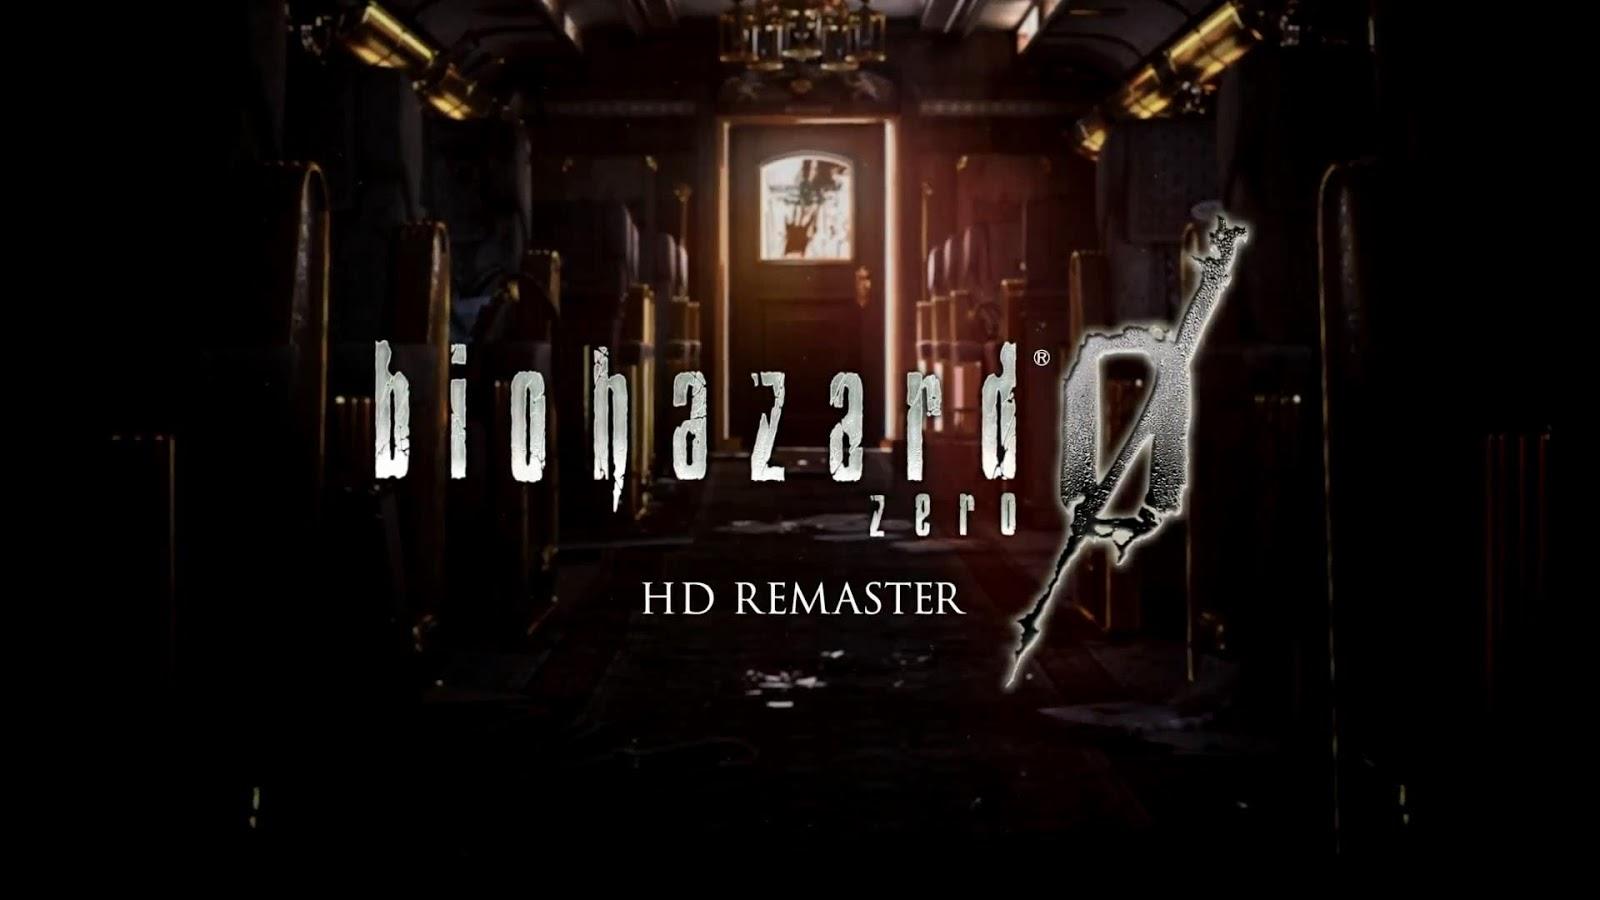 تحميل لعبة resident evil hd remaster pc